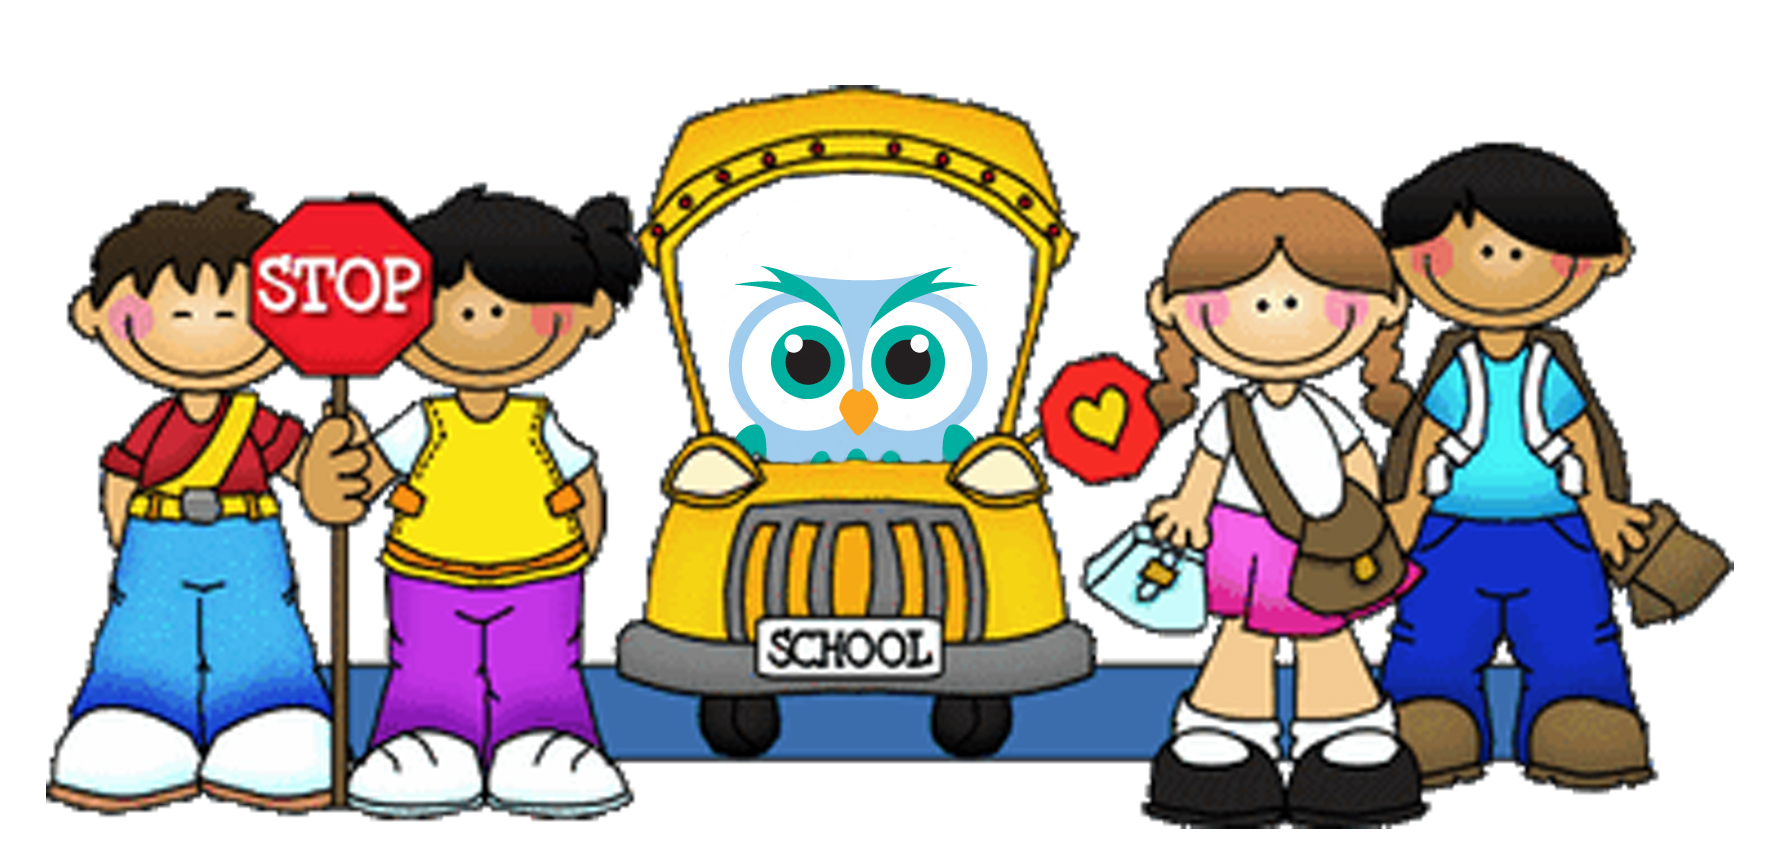 Back to school preschool. Welcome clipart free download